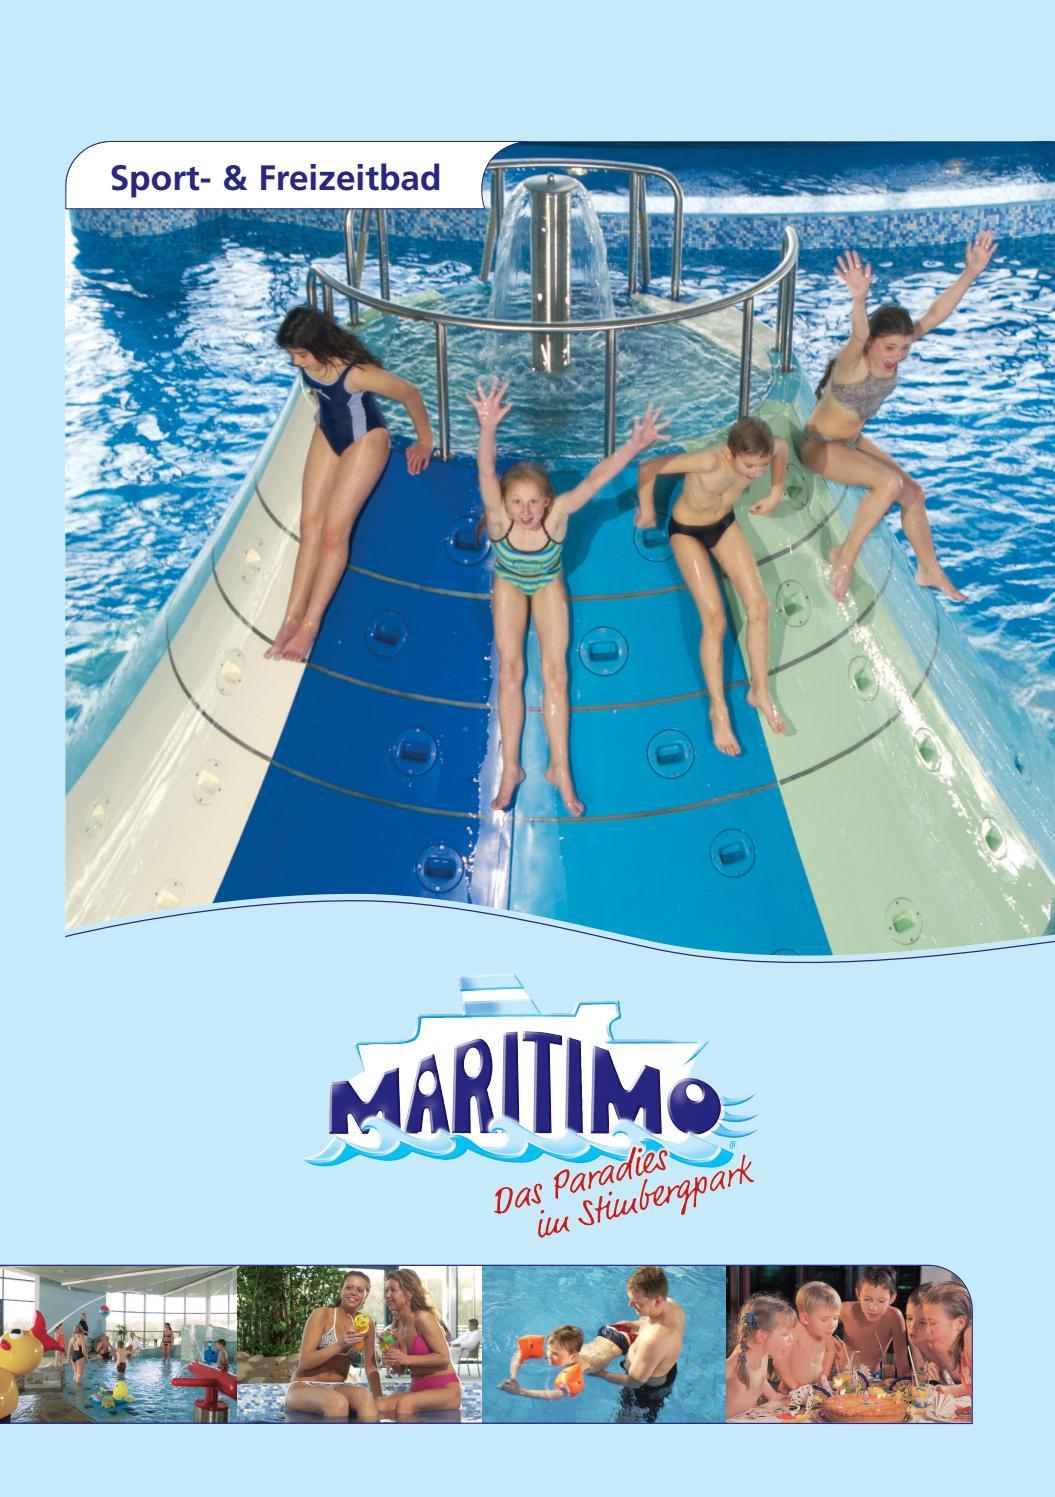 maritimo Sport- und Freizeitbad - maritimo Oer-Erkenschwick